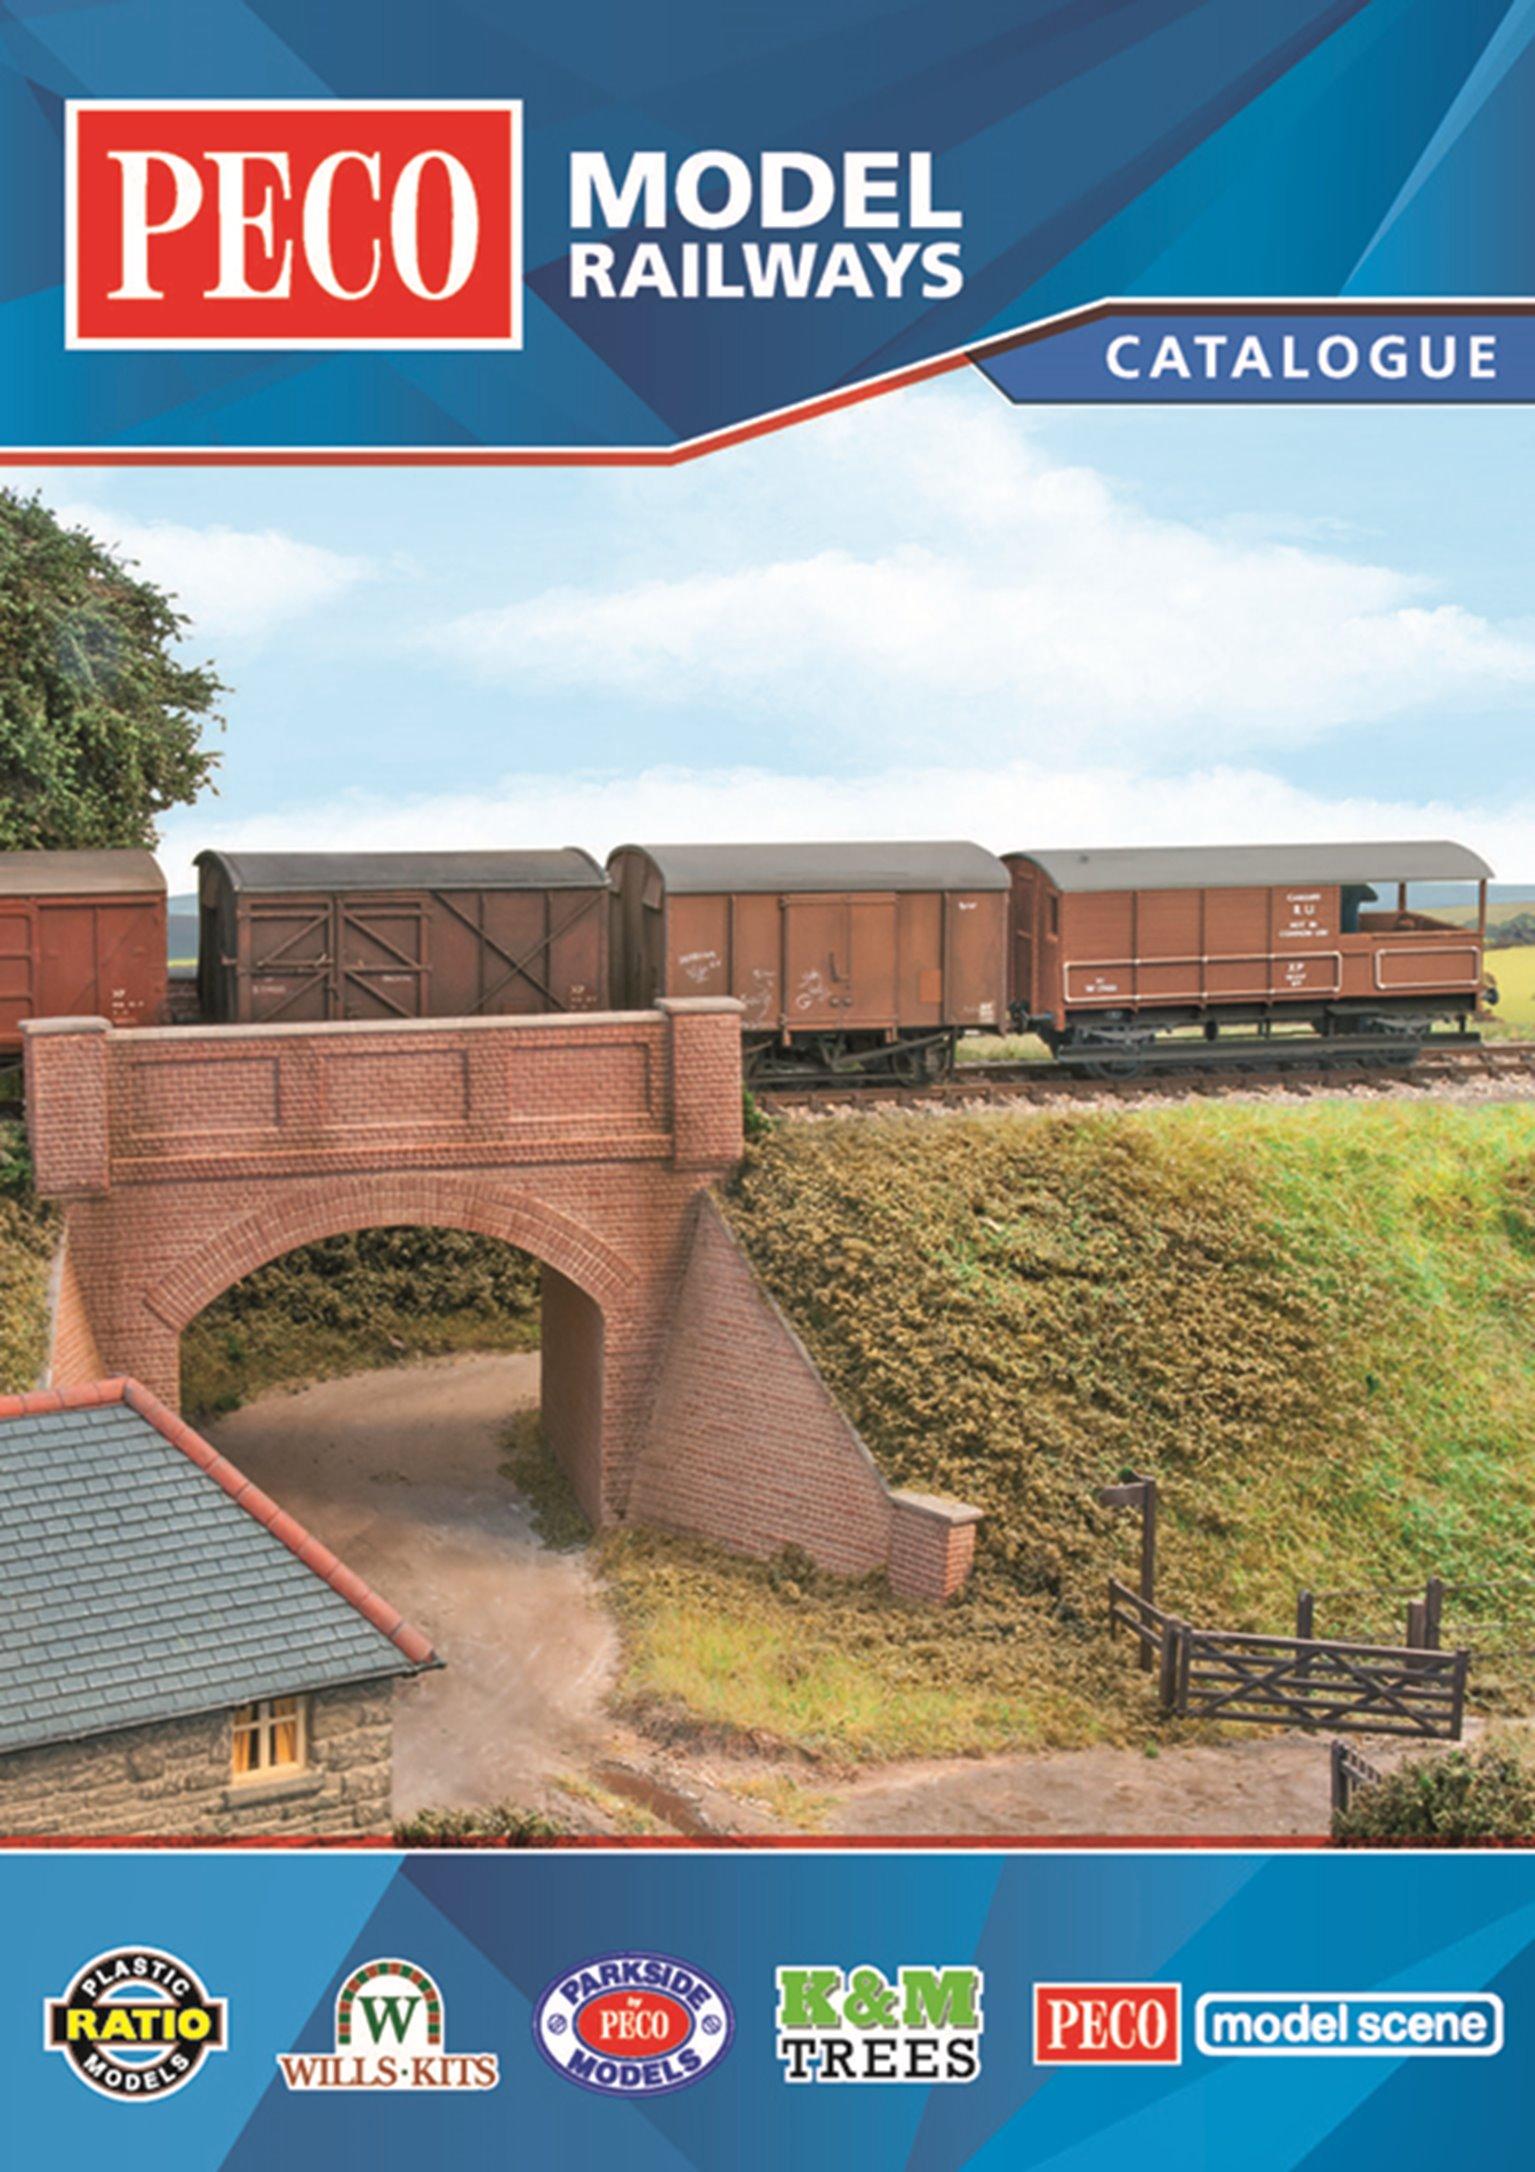 Peco Model Railways Catalogue